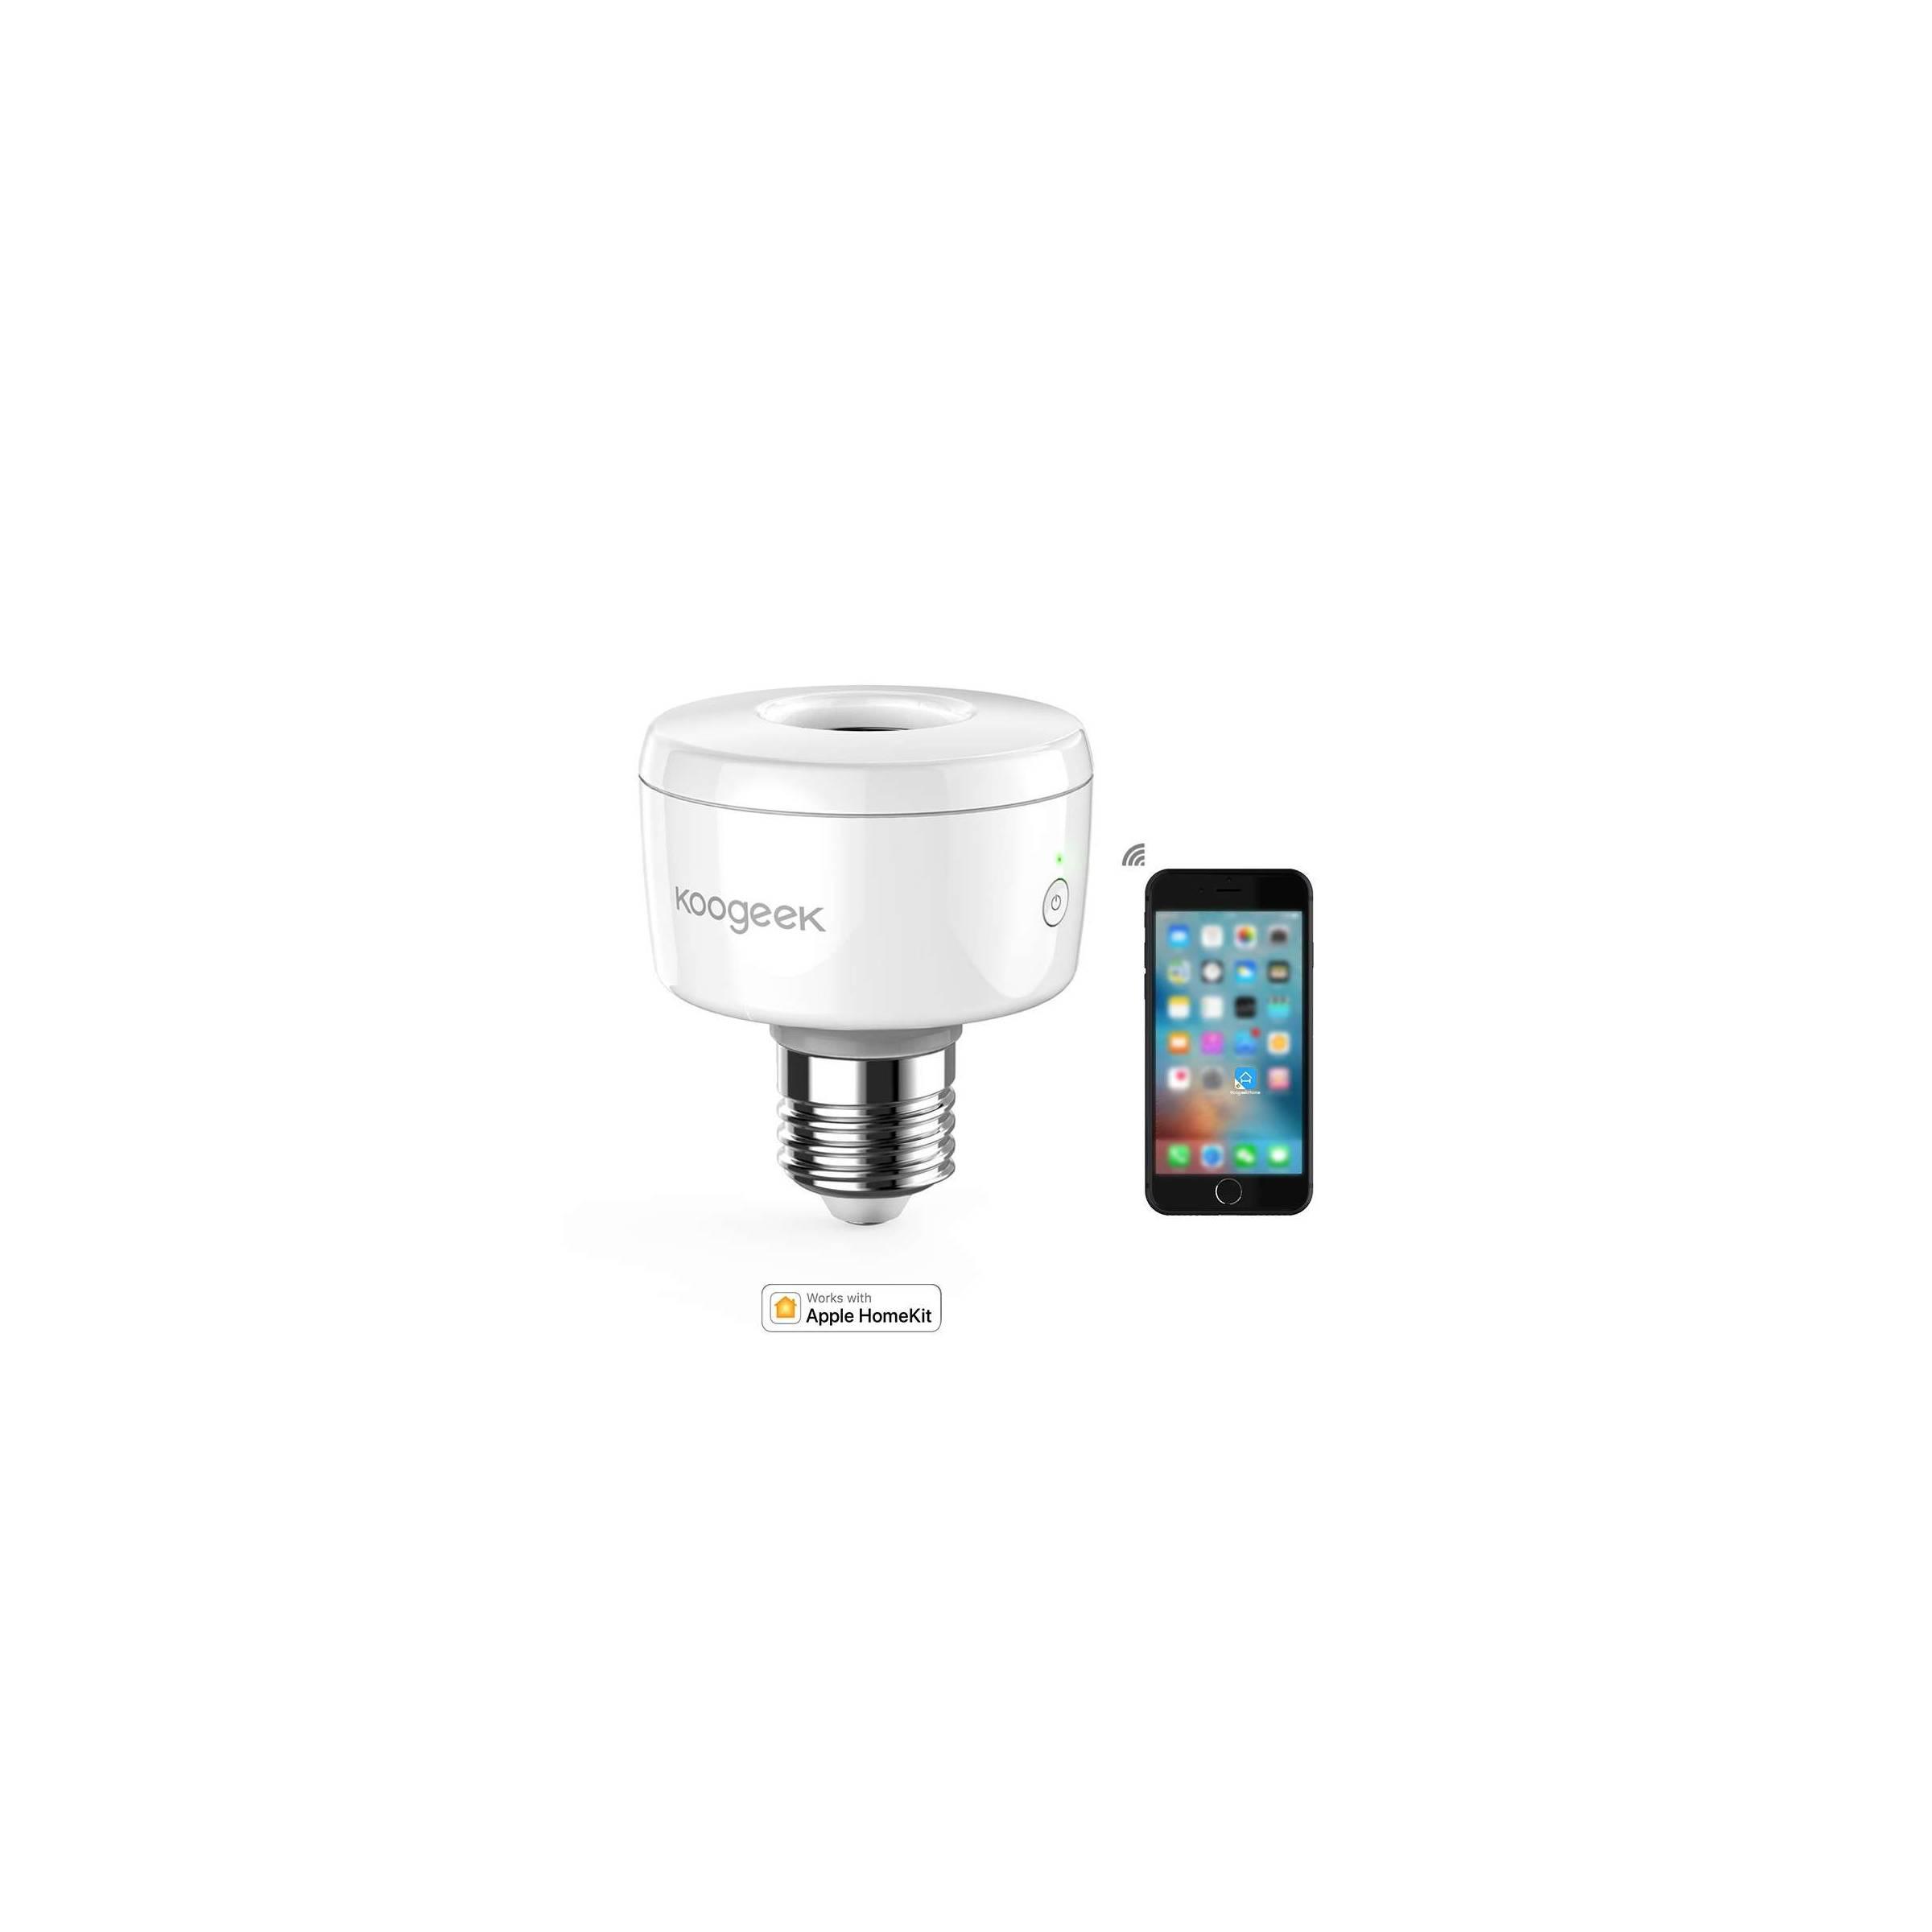 koogeek – Koogeek wi-fi smart e26 socket med homekit, alexa og google home (sk1) fra mackabler.dk